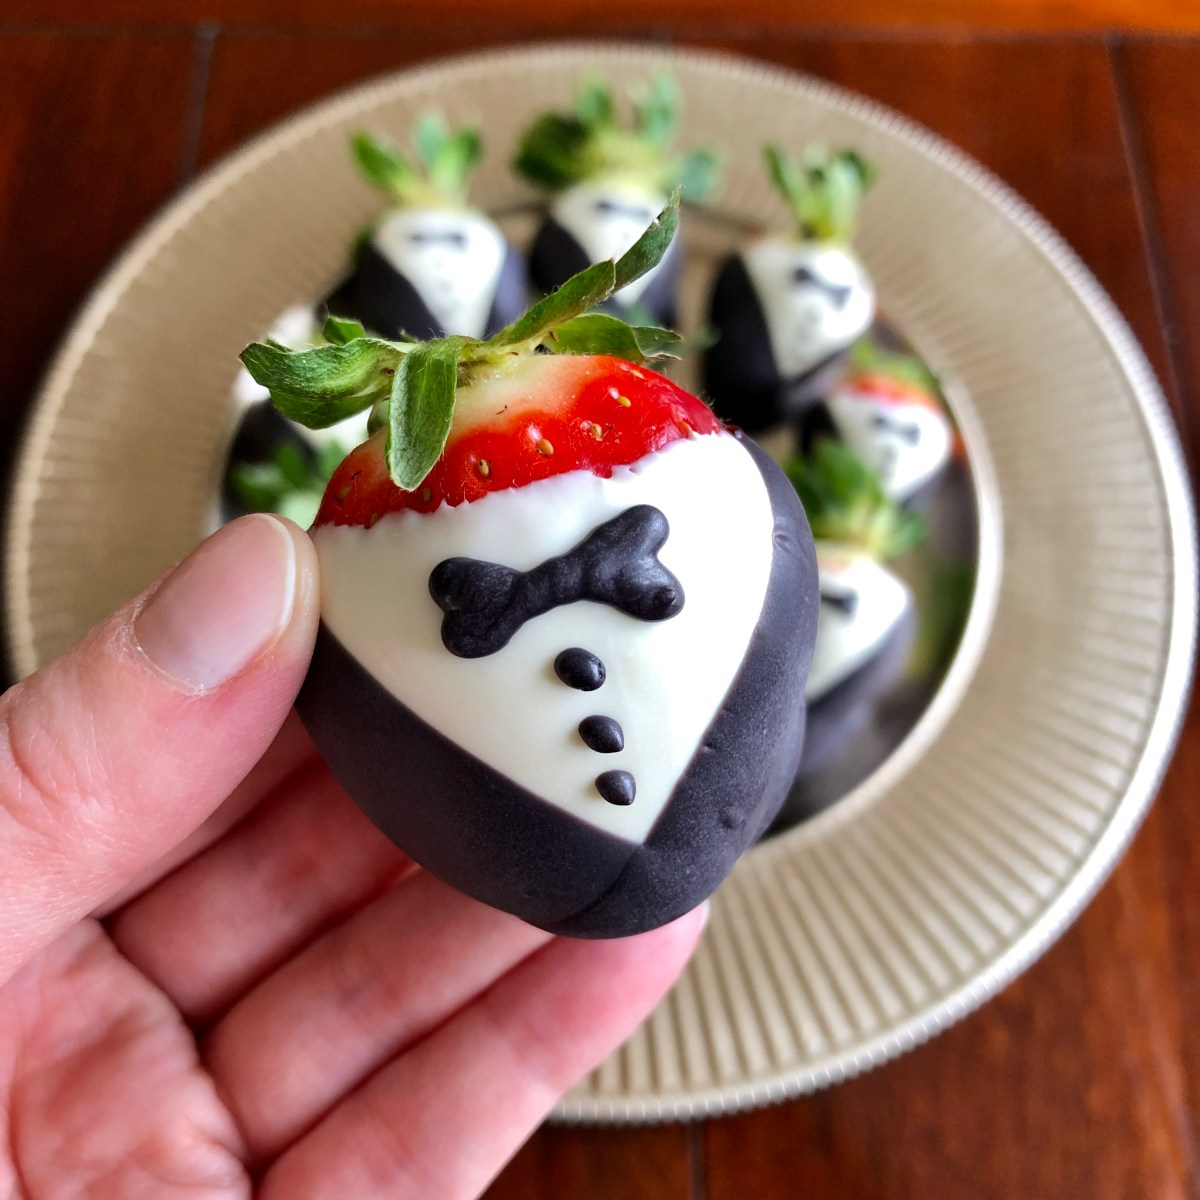 Tuxedo Strawberries by Happylifeblogspot.com #tuxedostrawberries #strawberries #weddingfavors #dessert #chocolatecoveredstrawberries